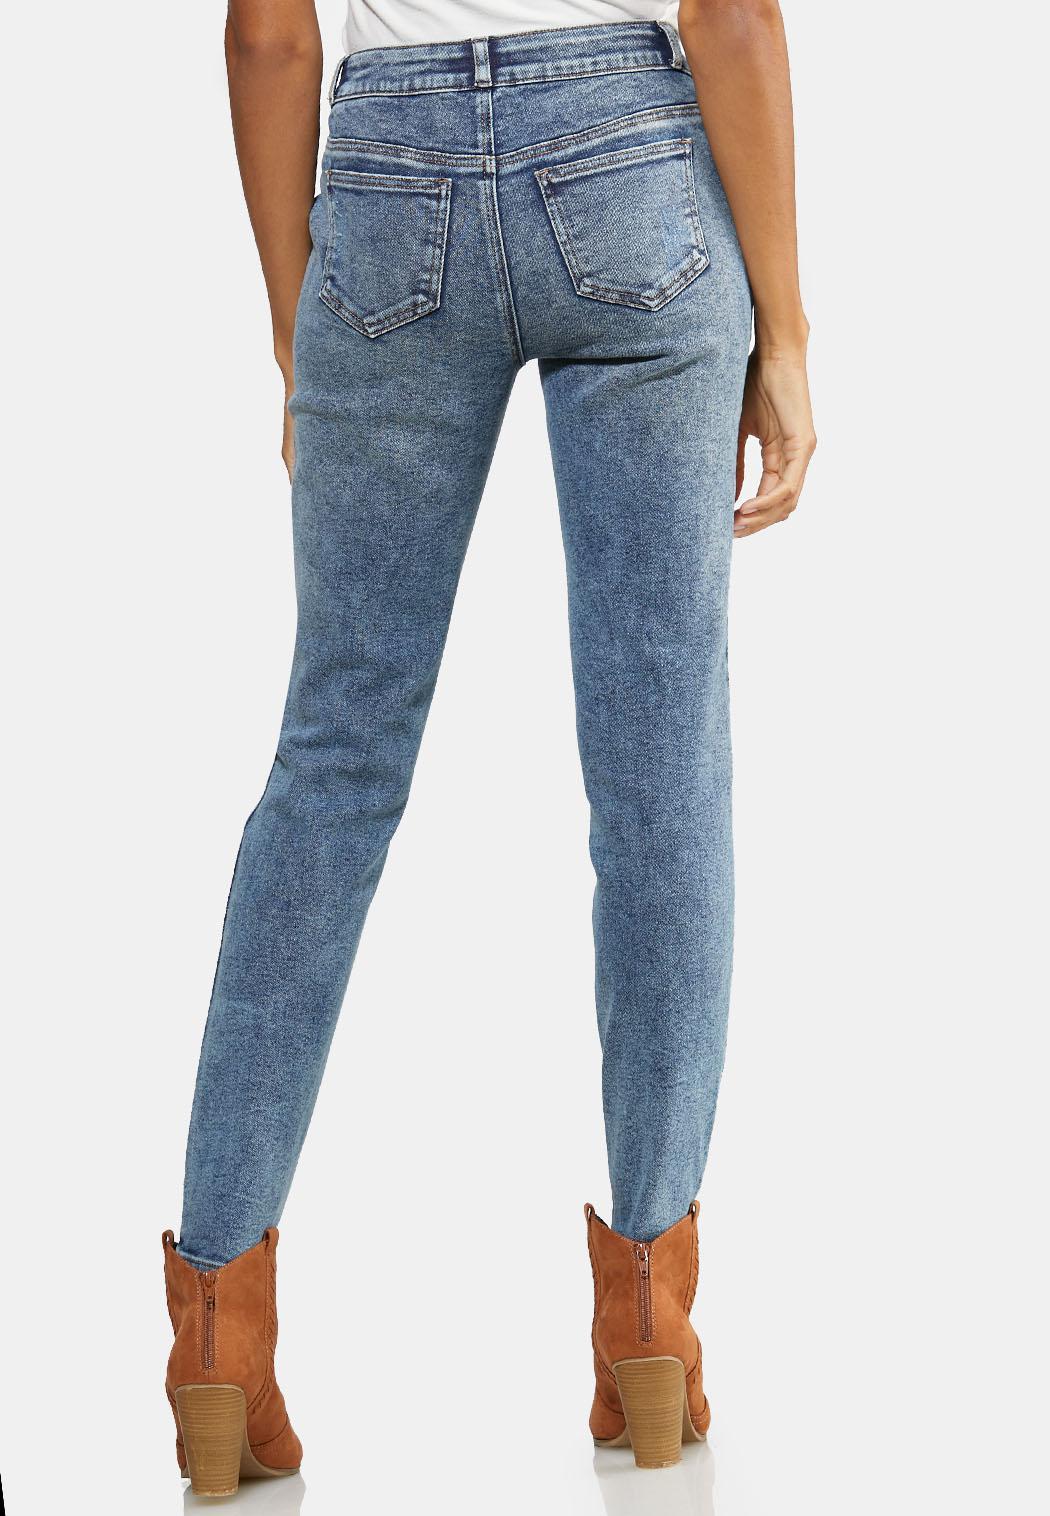 Acid Wash Skinny Jeans (Item #43991651)